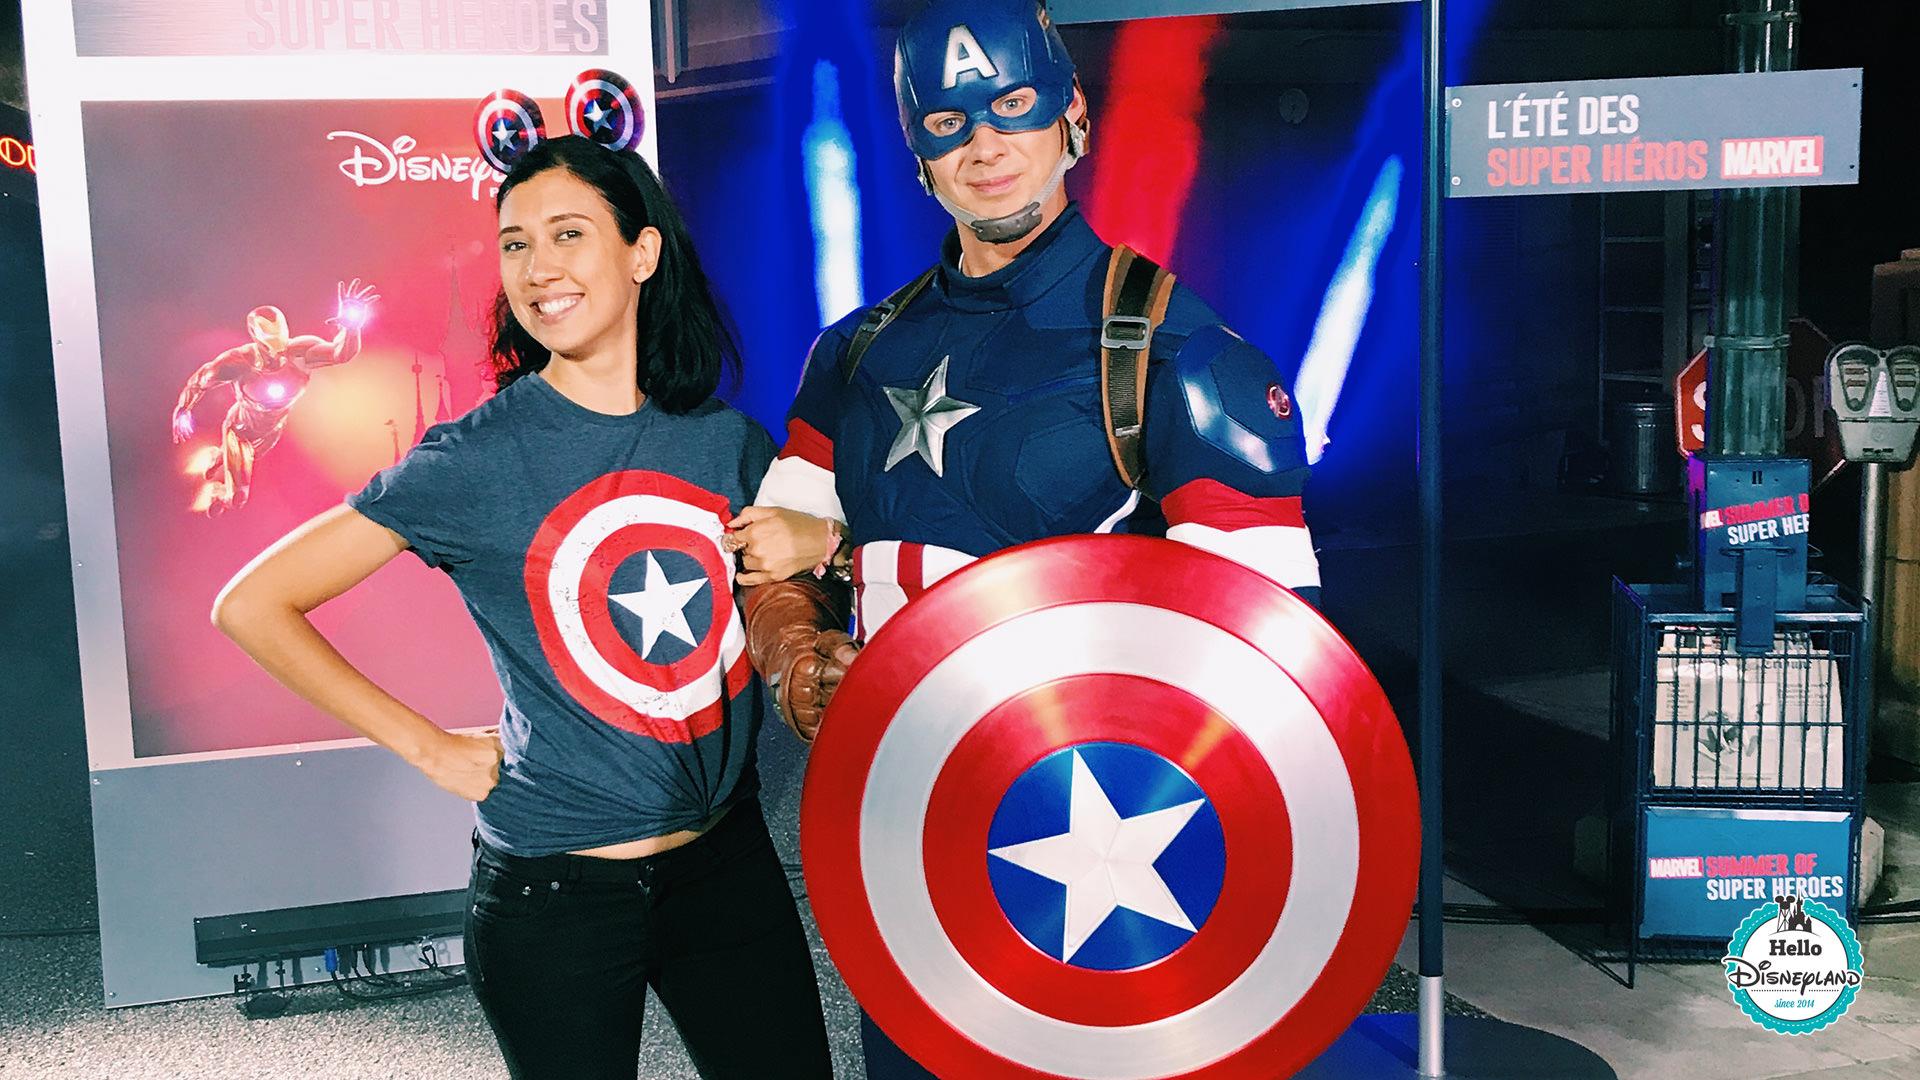 Ete des super heros - Disneyland Paris